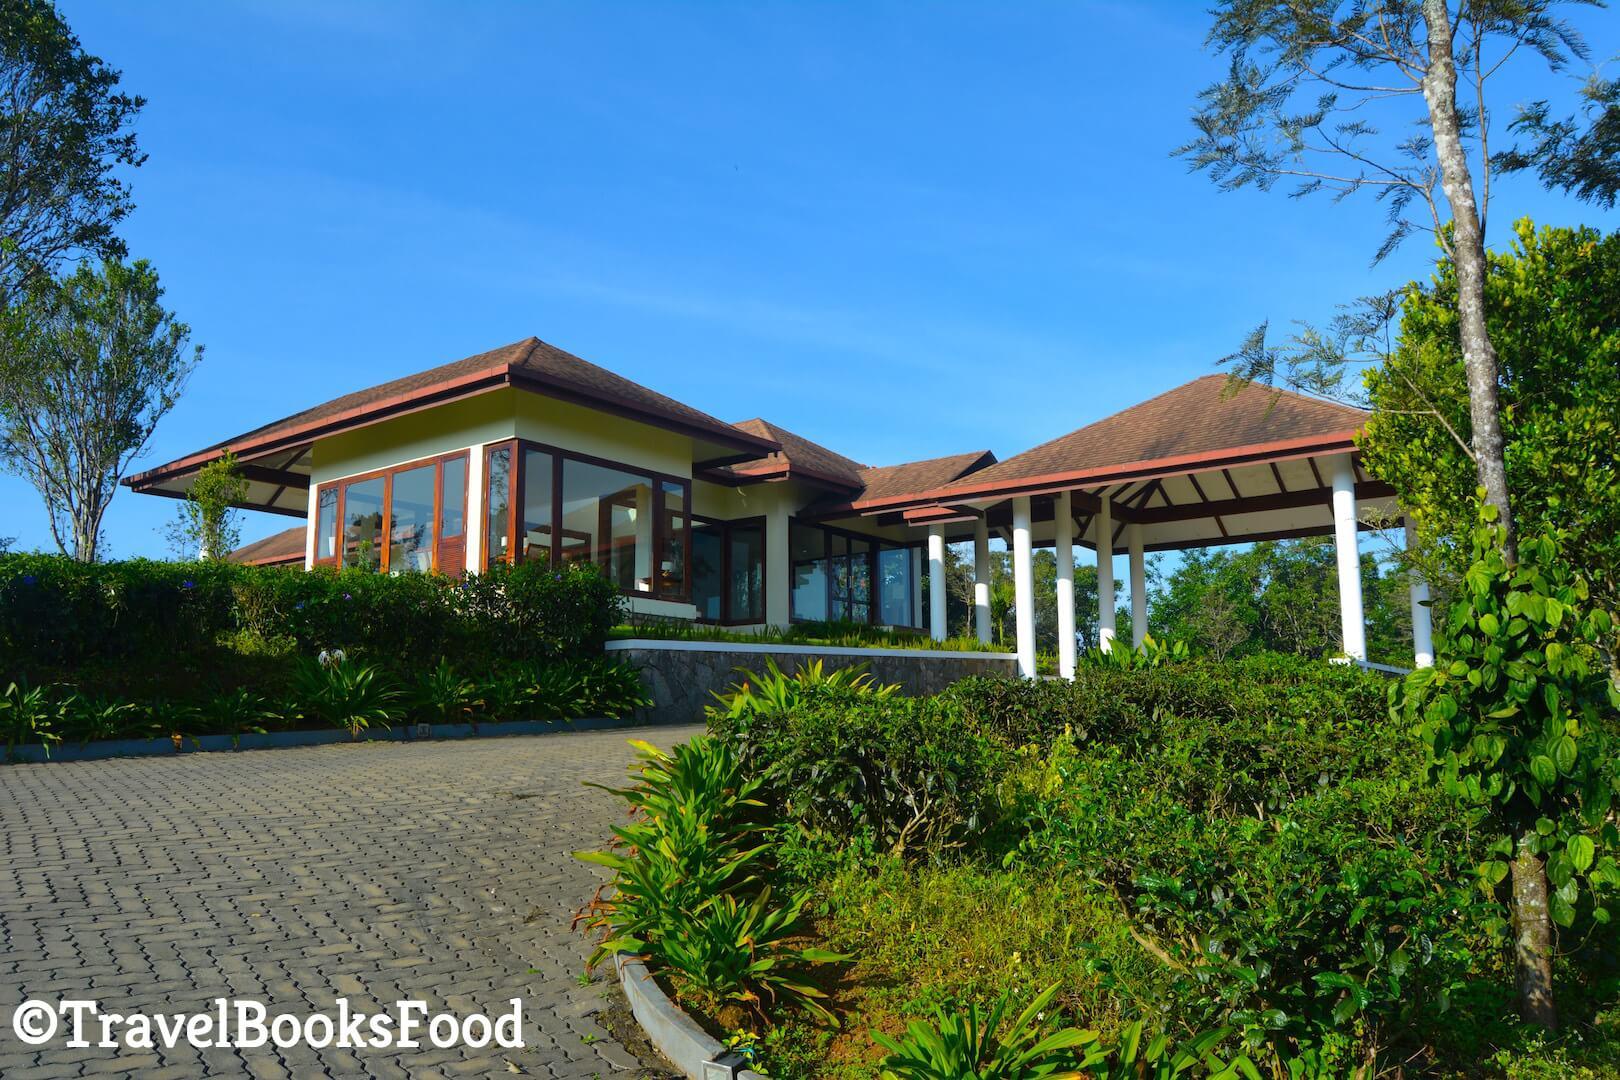 Photo of the reception of Carmelia Haven Resort in Thekkady, Kerala, India.